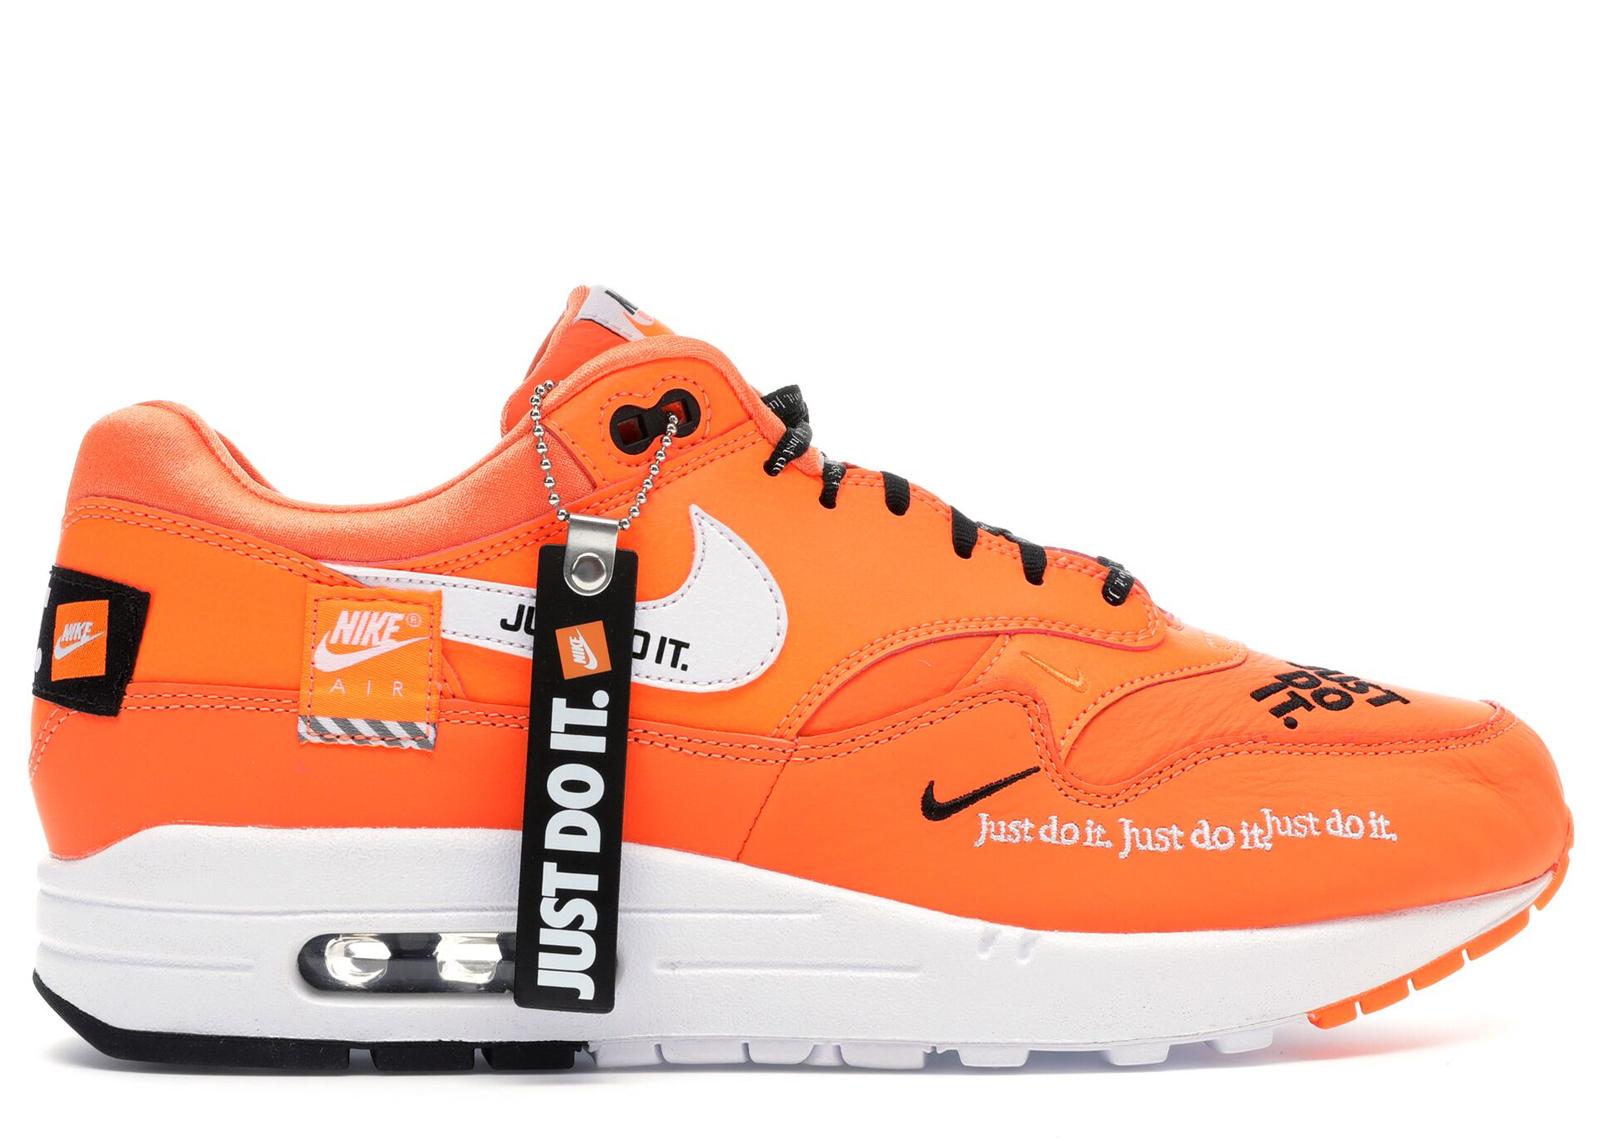 Nike Air Max 1 Just Do It Orange (W) - 917691-800